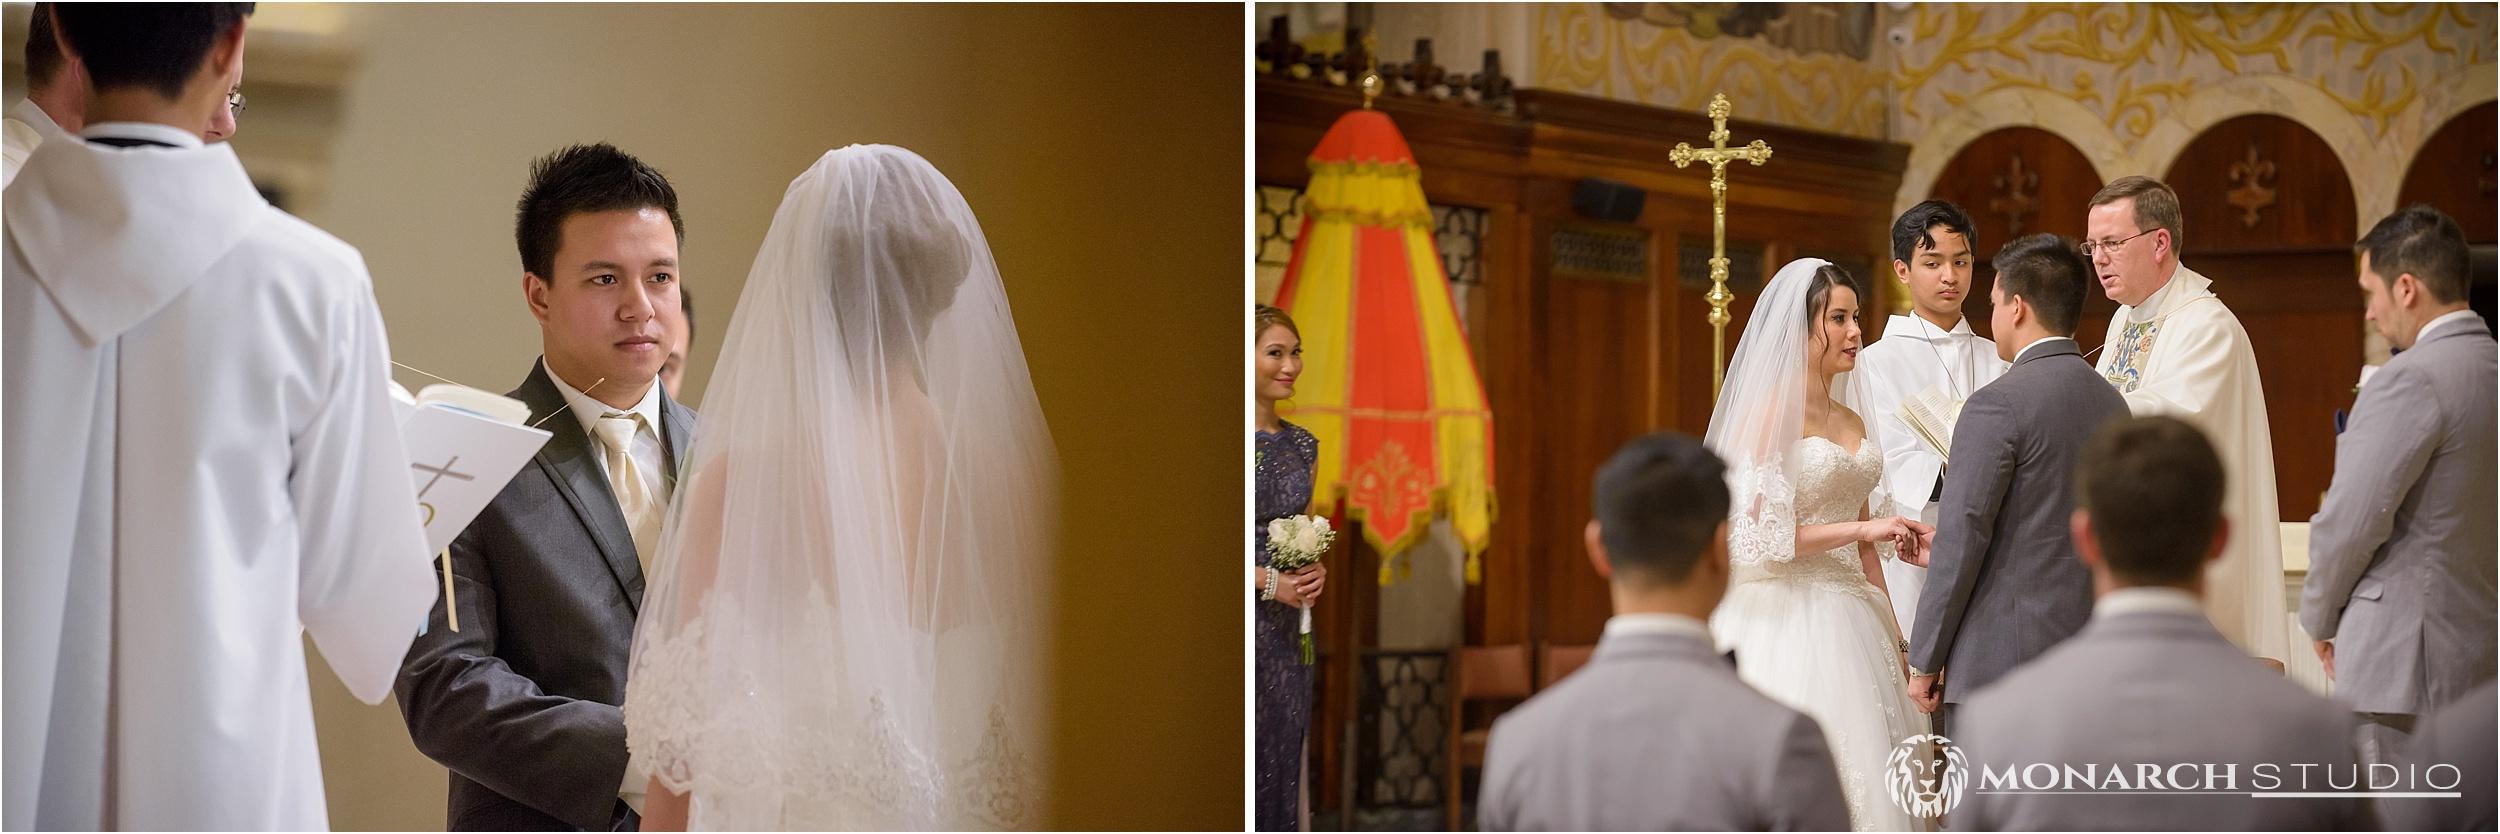 wedding-photographer-in-st-augustine-florida-treasury-050.jpg